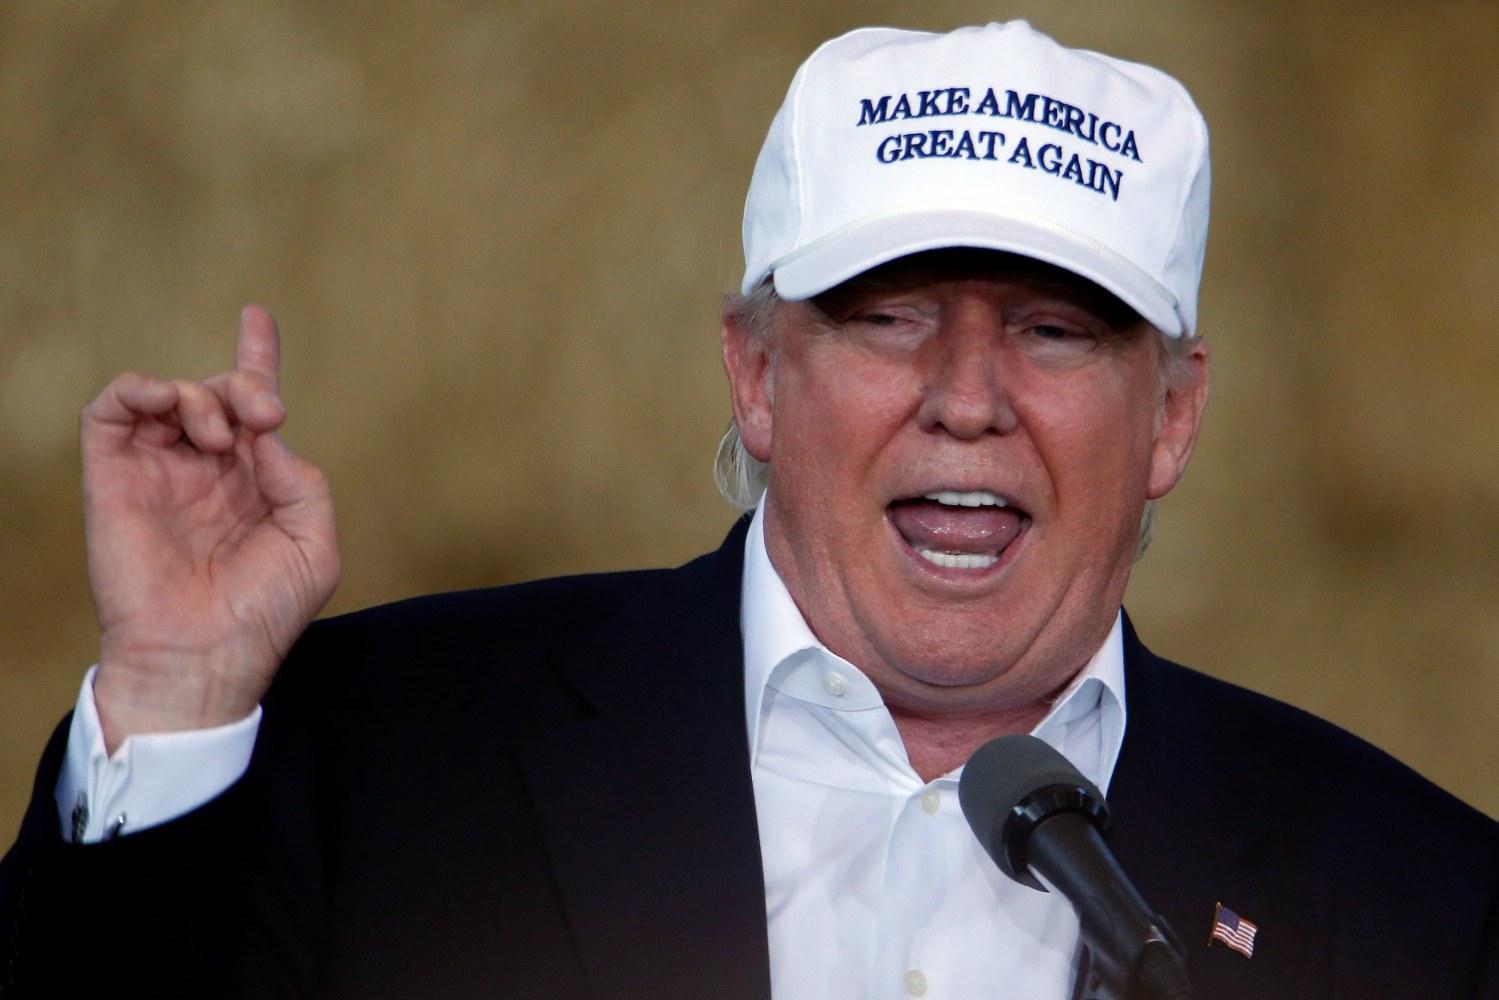 'Make America Great Again'—Who Said It First? - NBC News